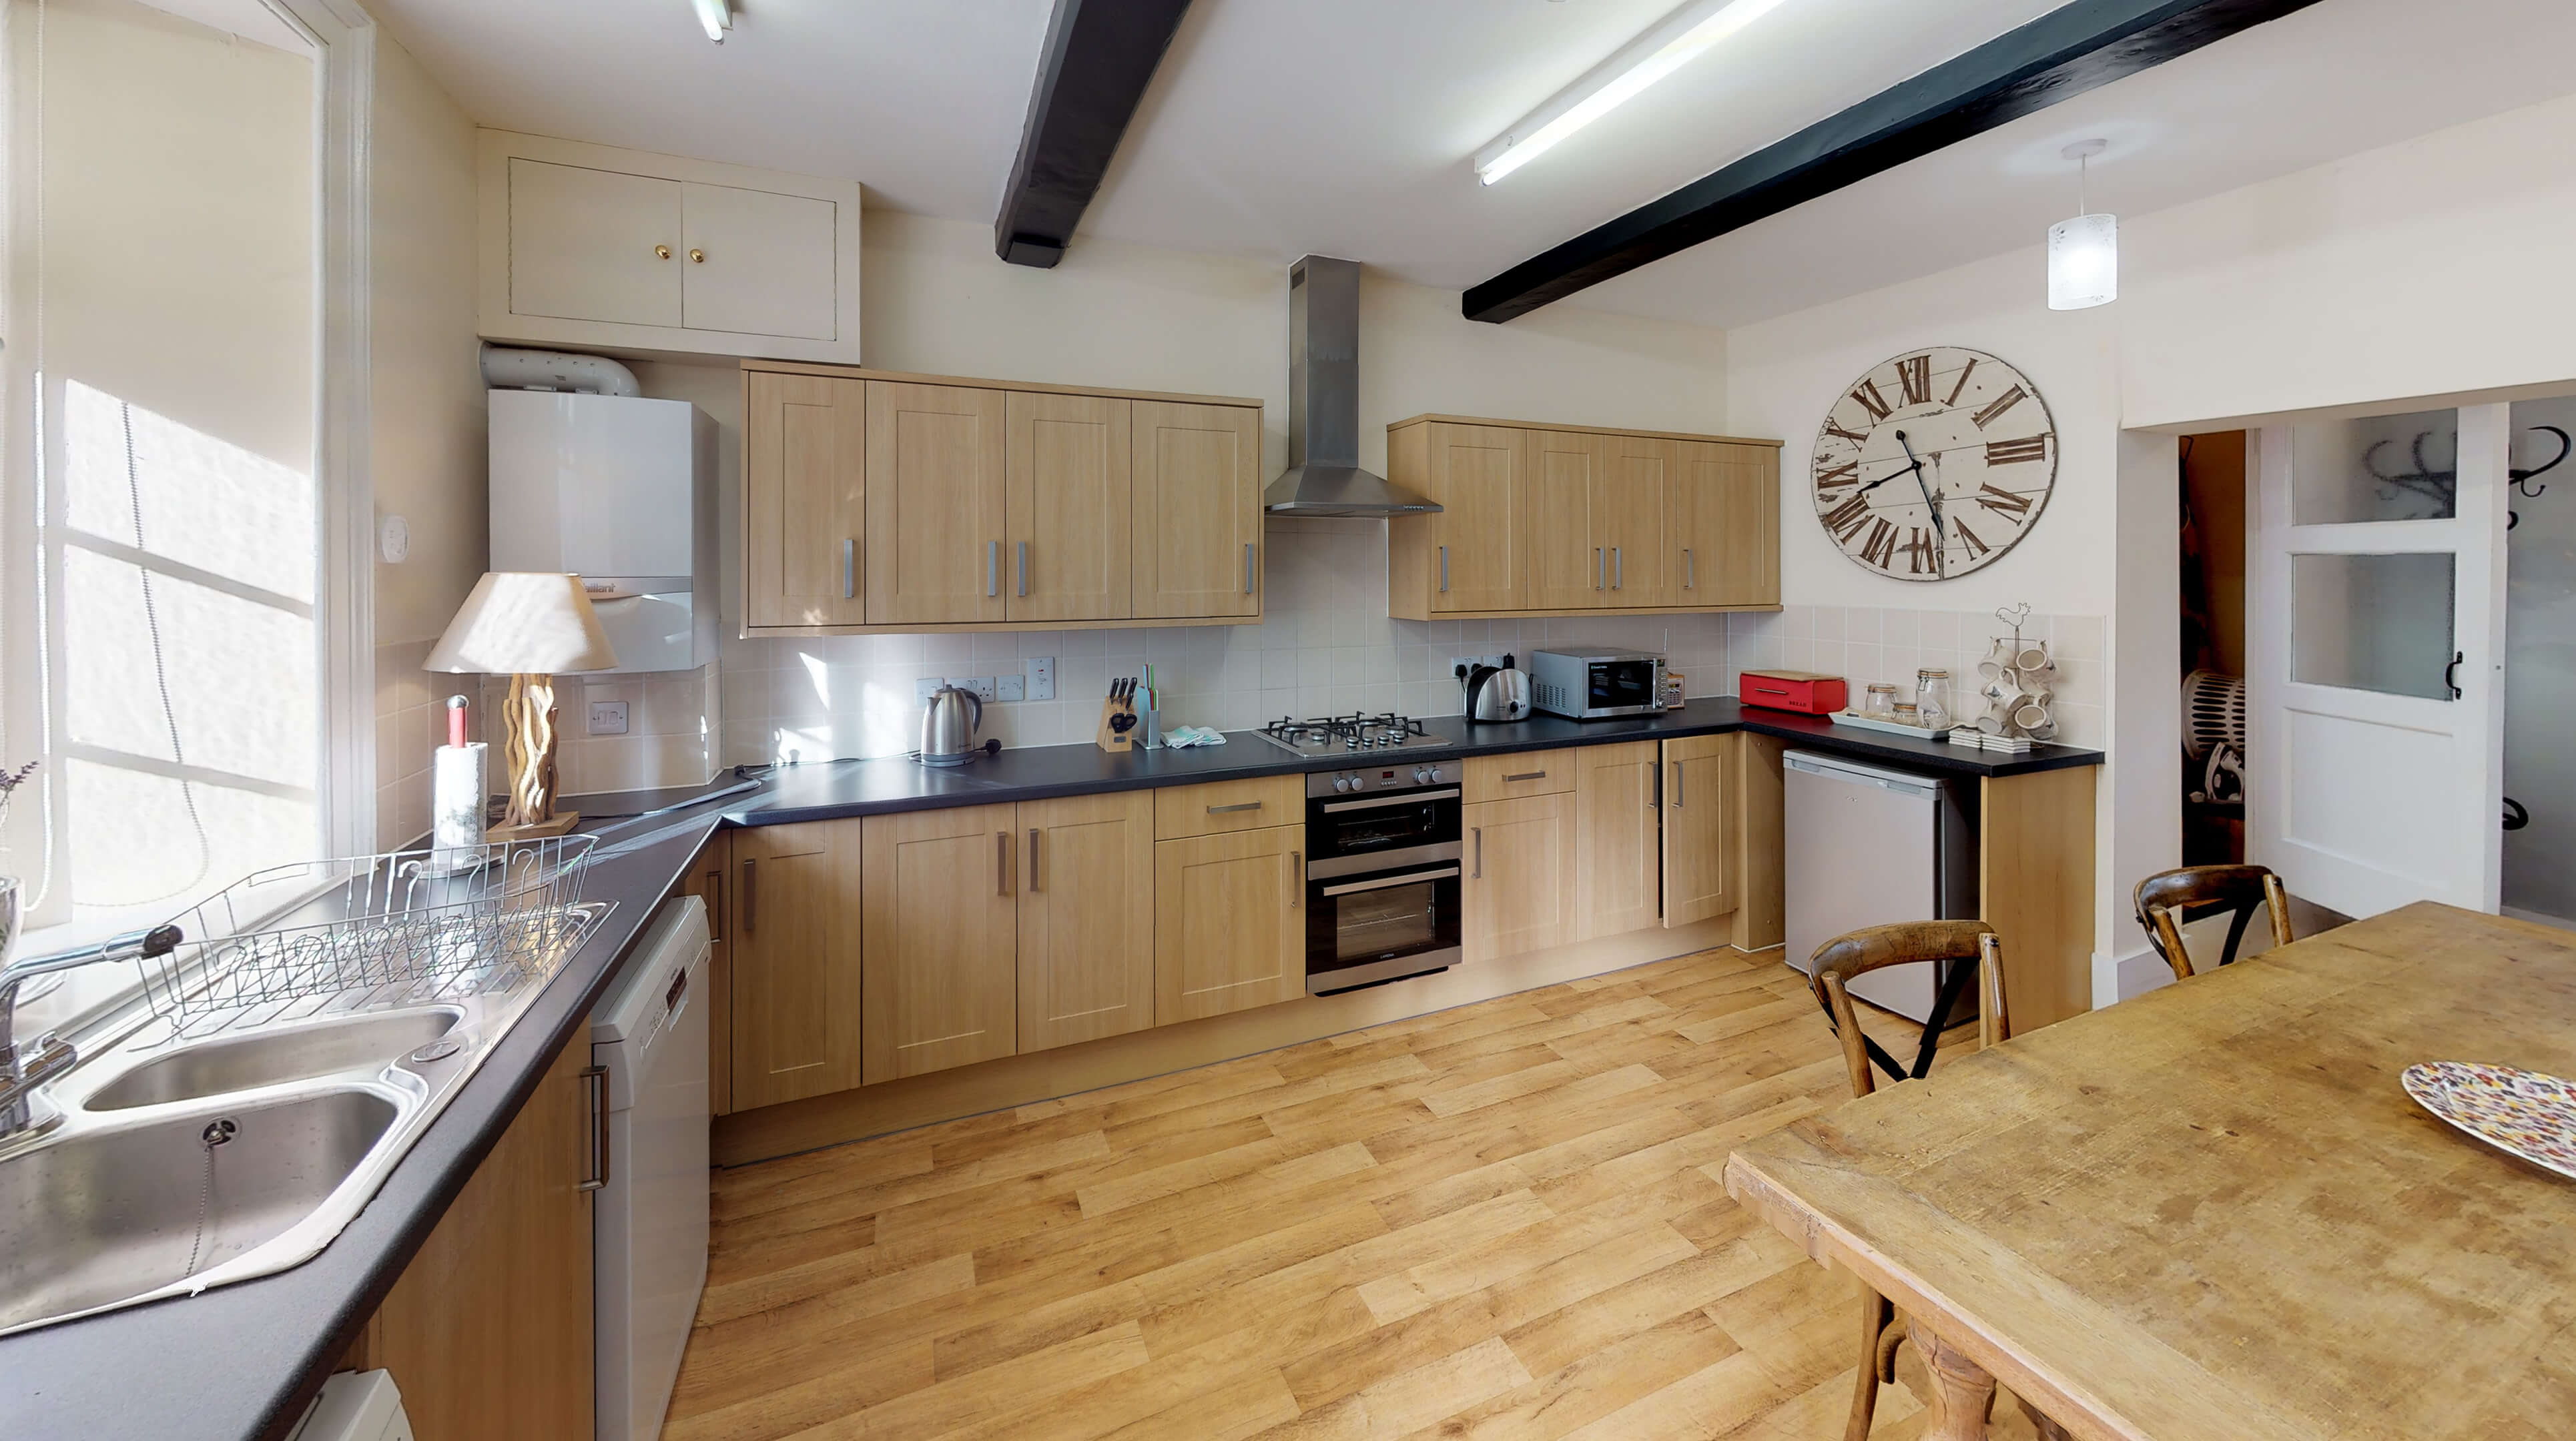 Bladon Two Bedroom Home Farm Cottage Kitchen 2